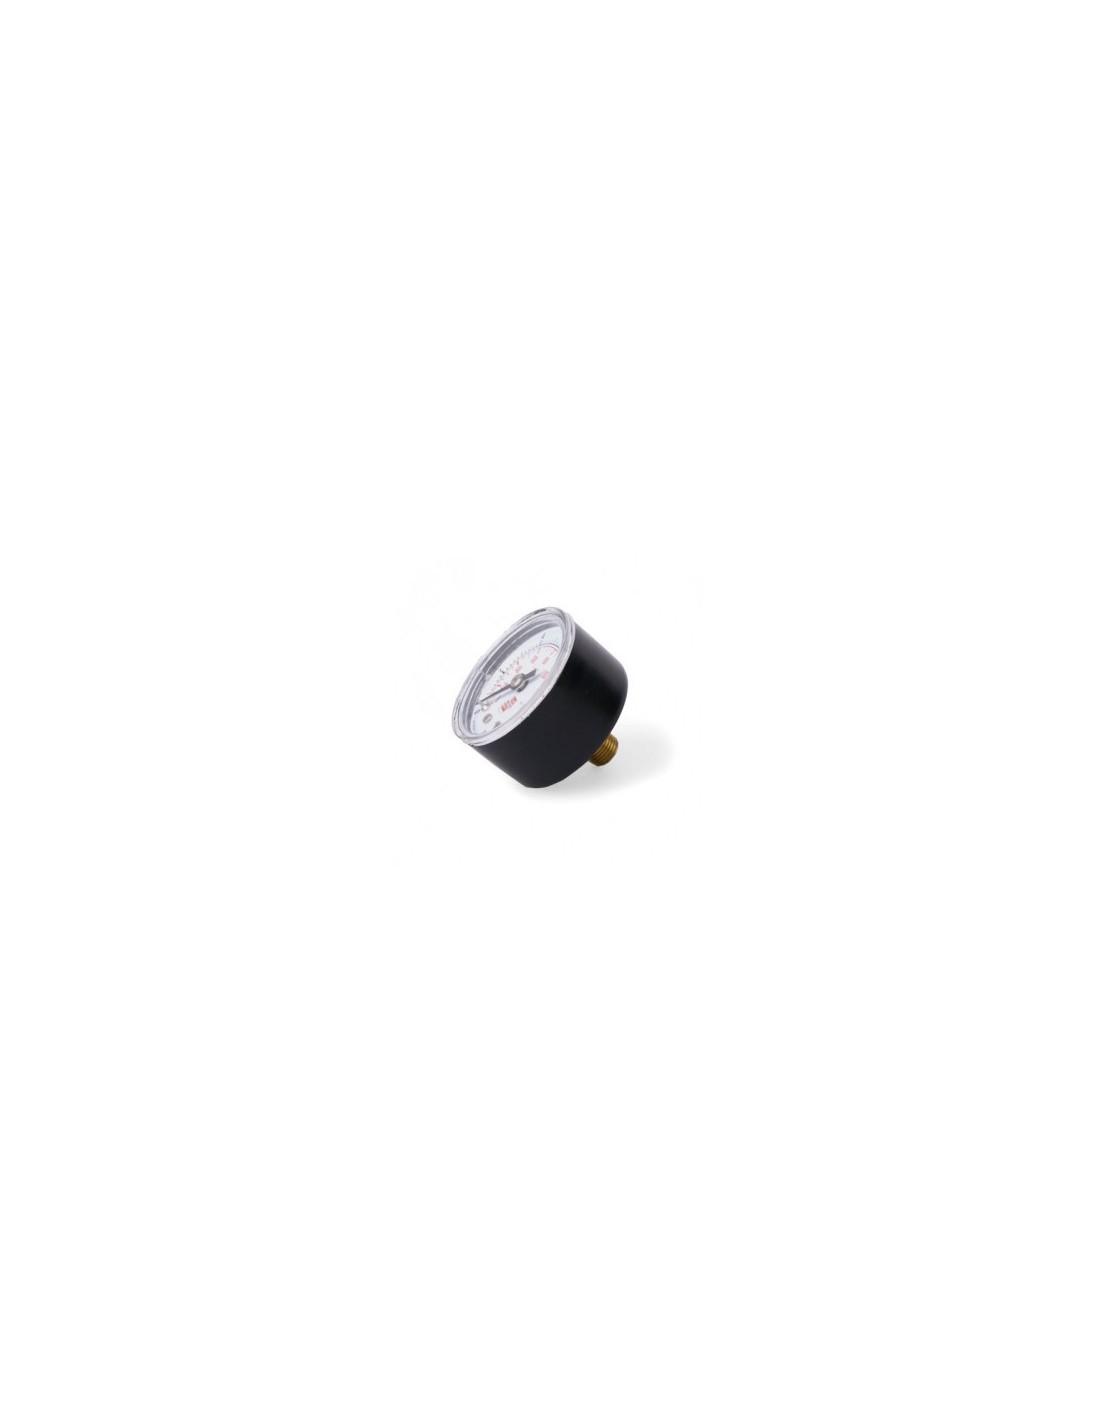 OST01939 - Manometer 40 mm 1-10 bar